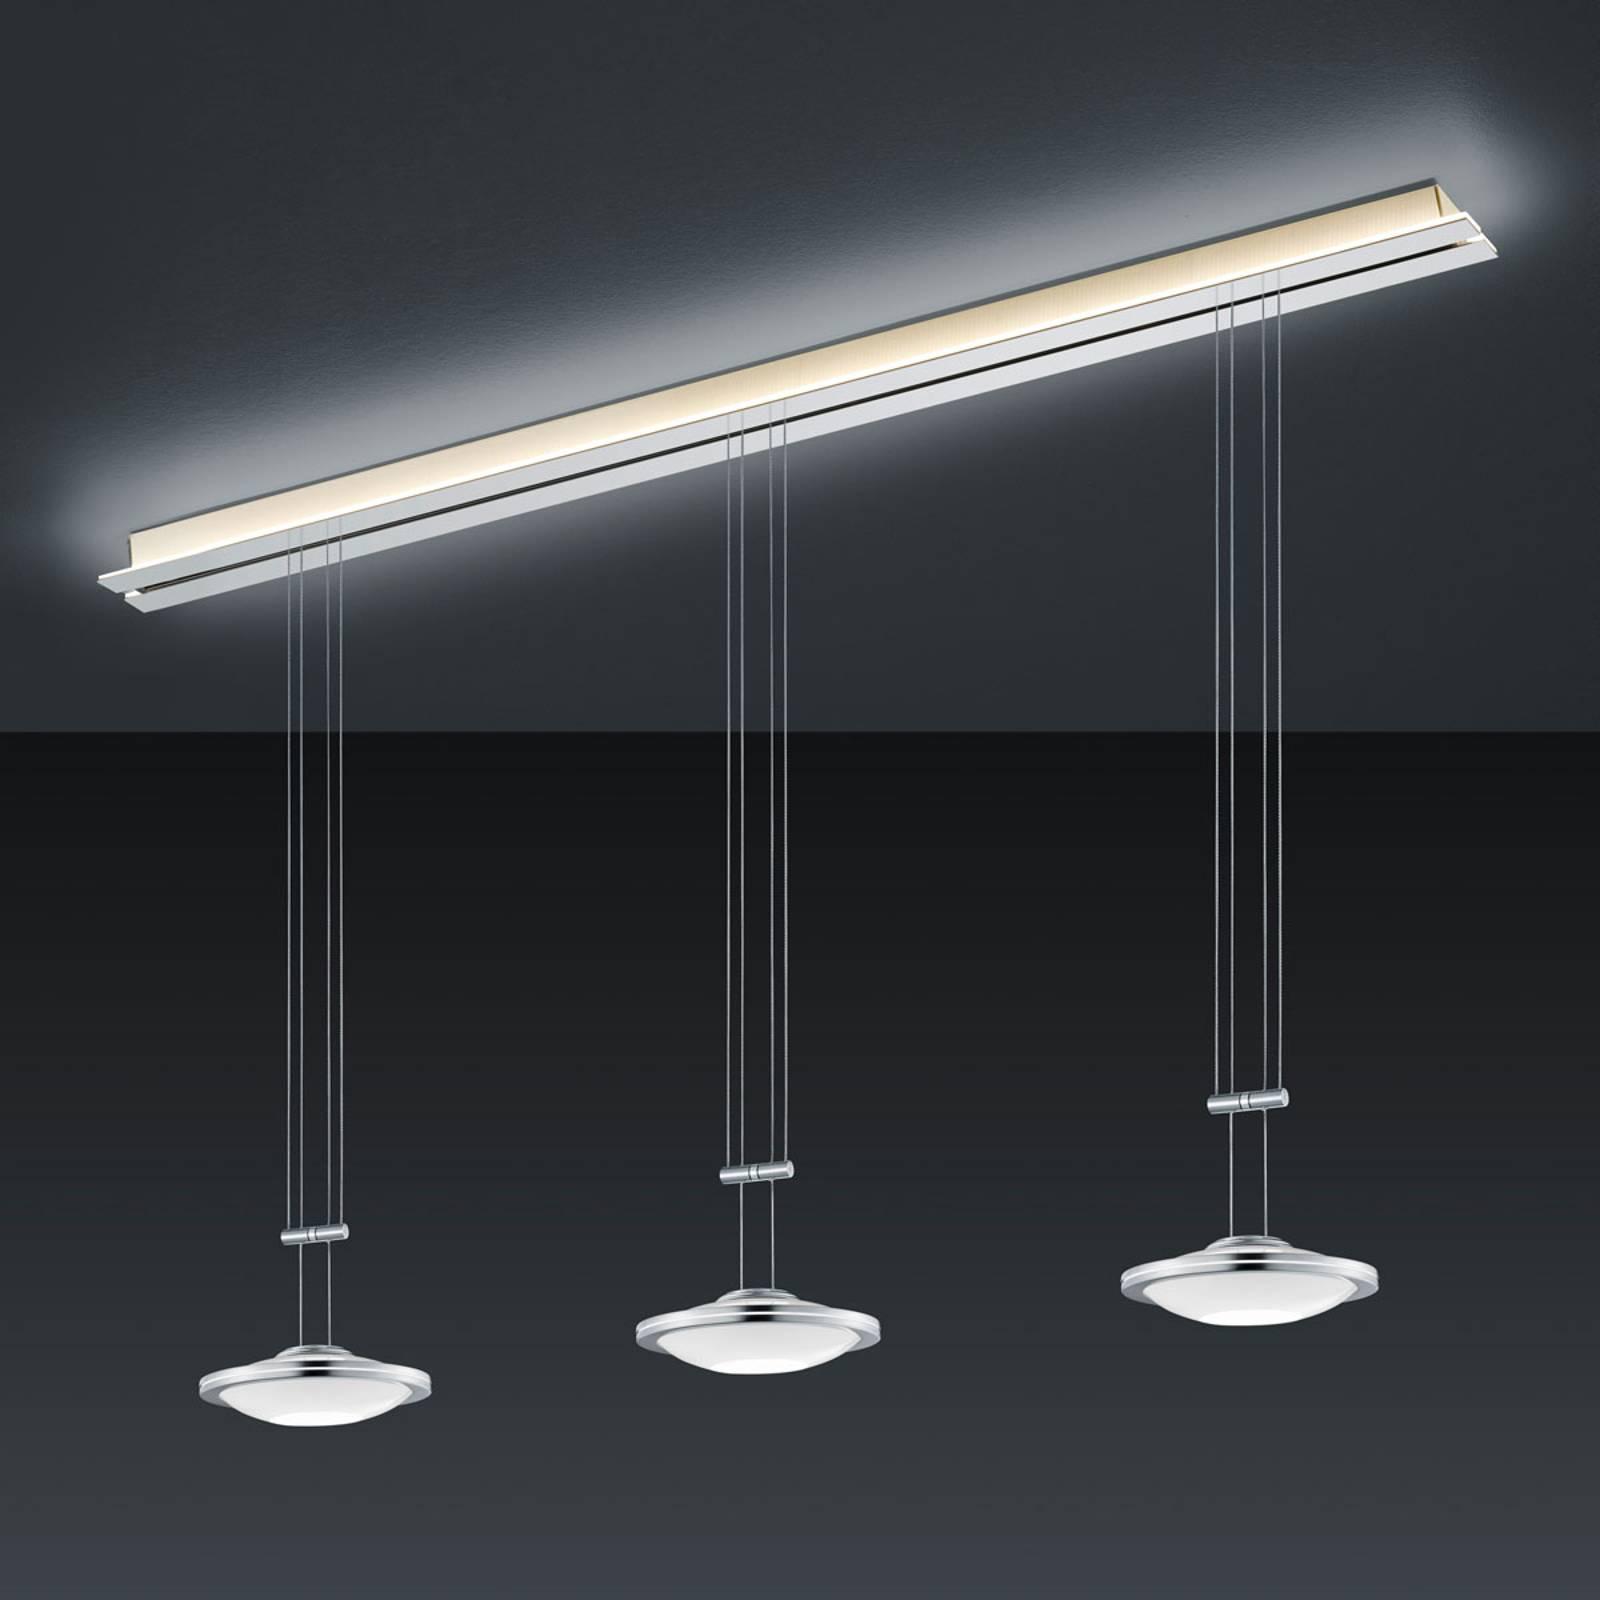 BANKAMP Strada Saturno hanglamp, 3 lampjes, 155 cm